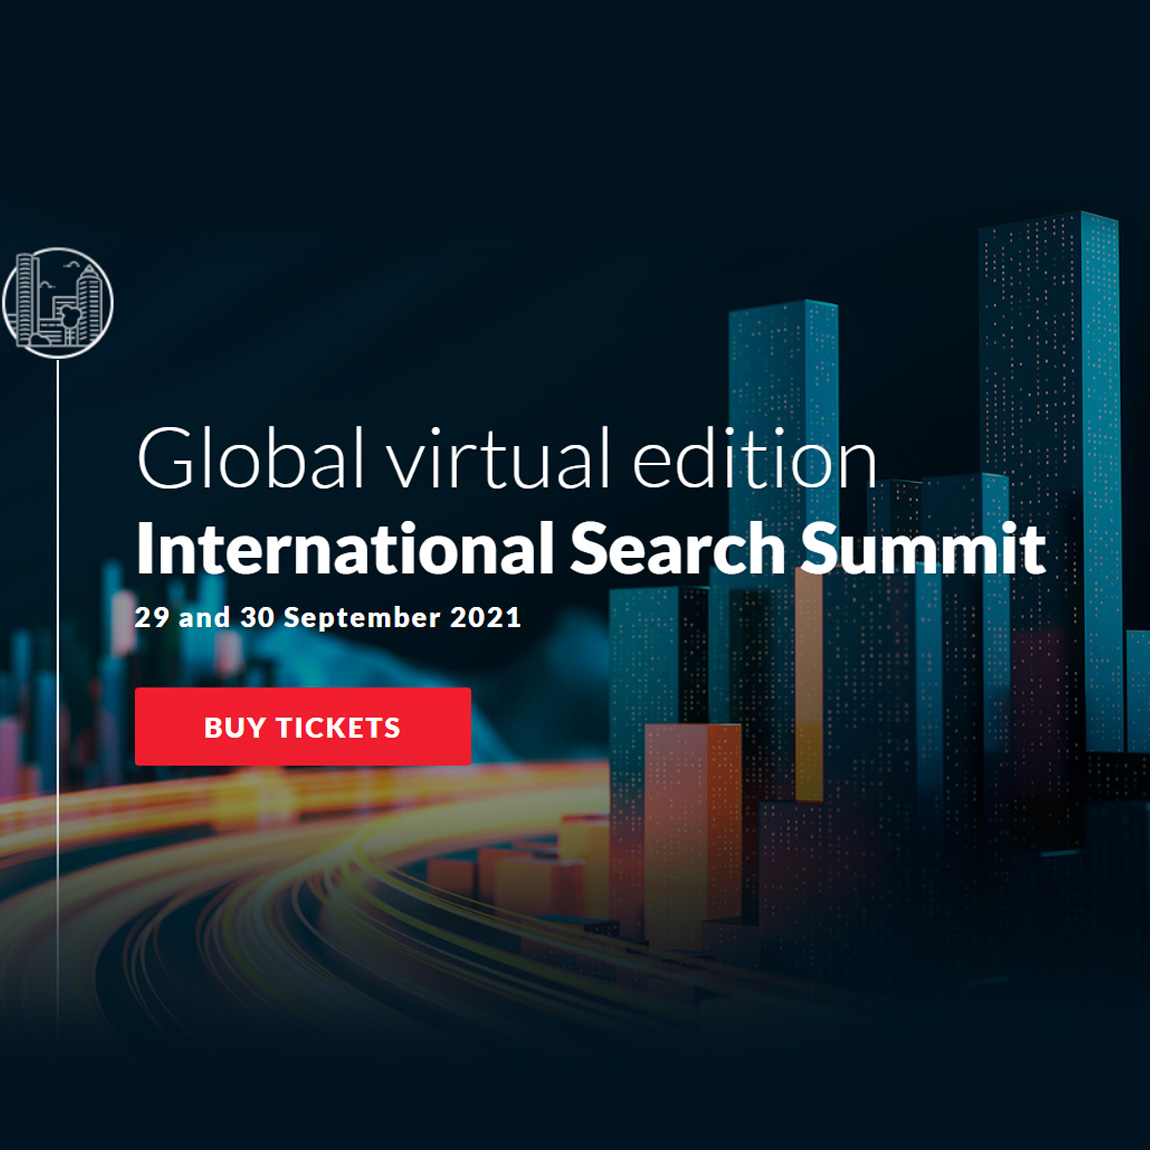 International Search Summit: Global Virtual Edition